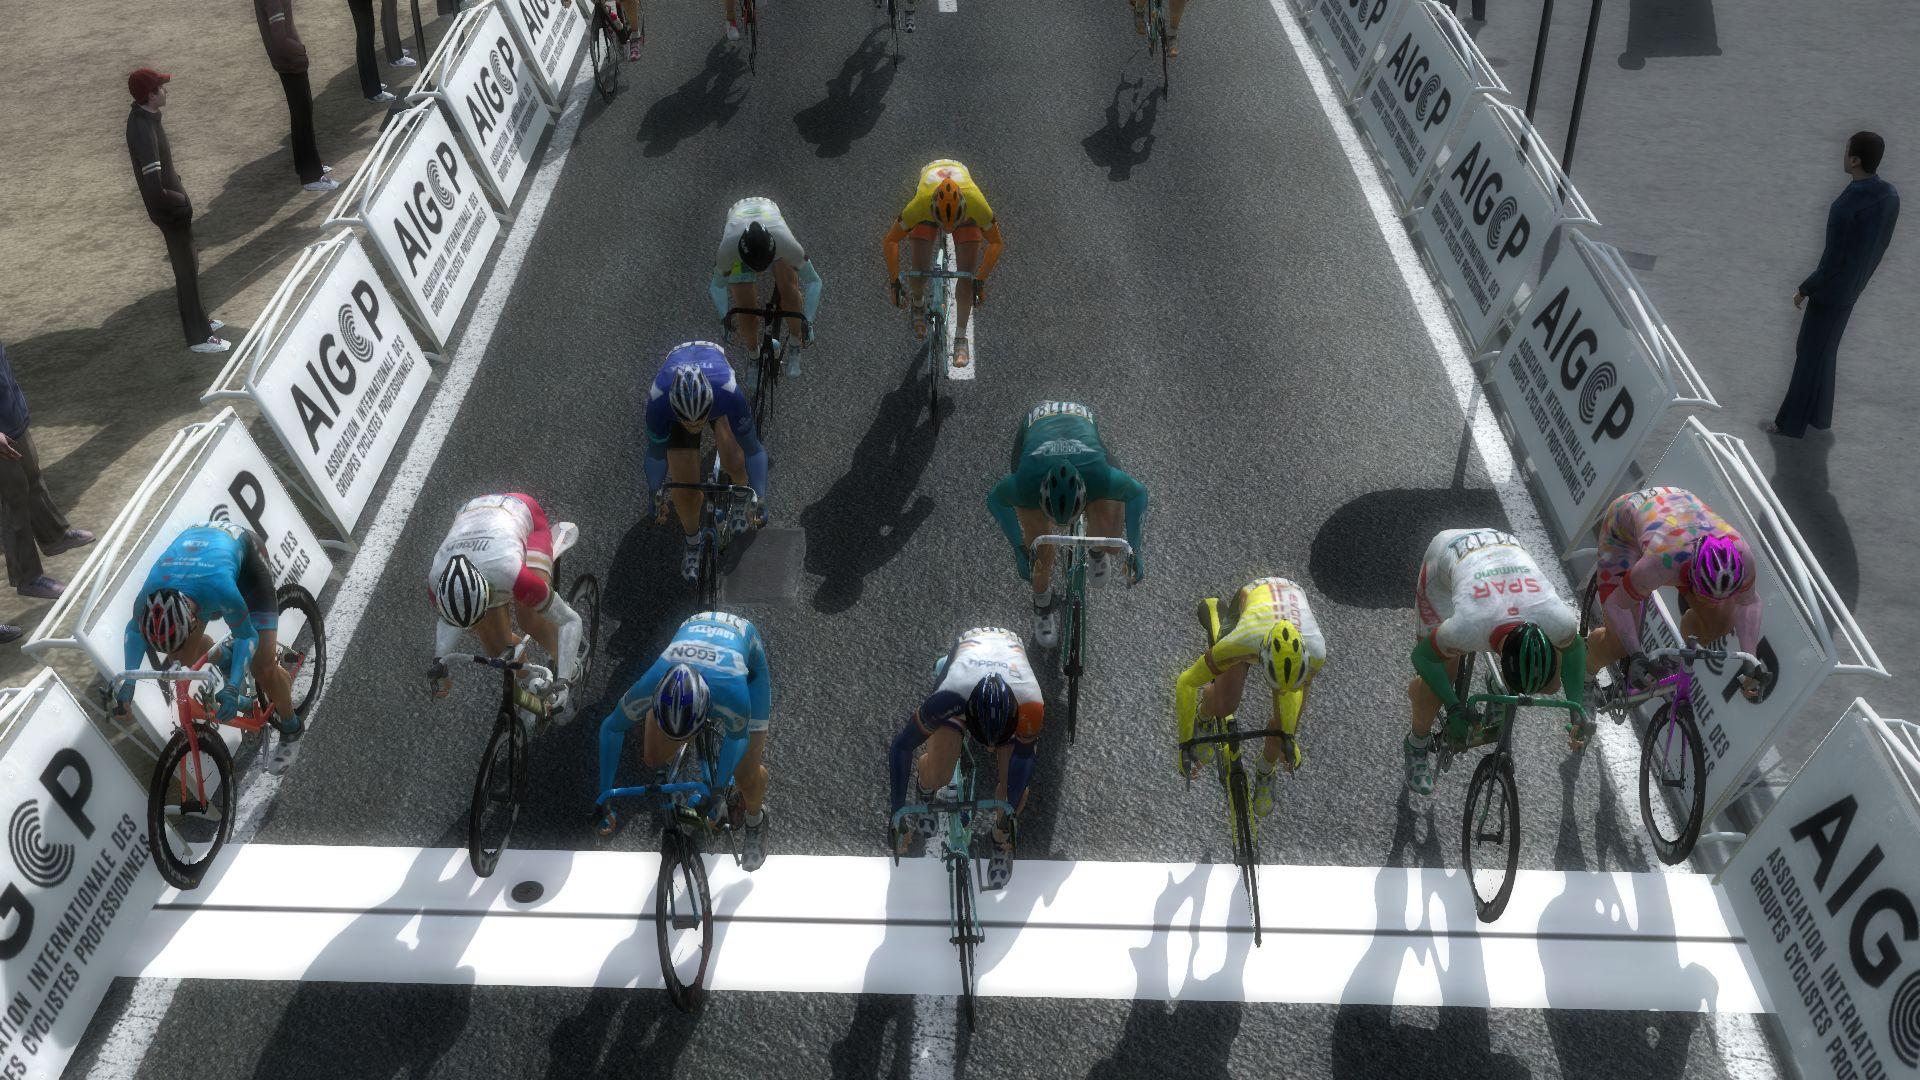 pcmdaily.com/images/mg/2019/Races/PT/Qatar/mg19_qat_s05_19.jpg